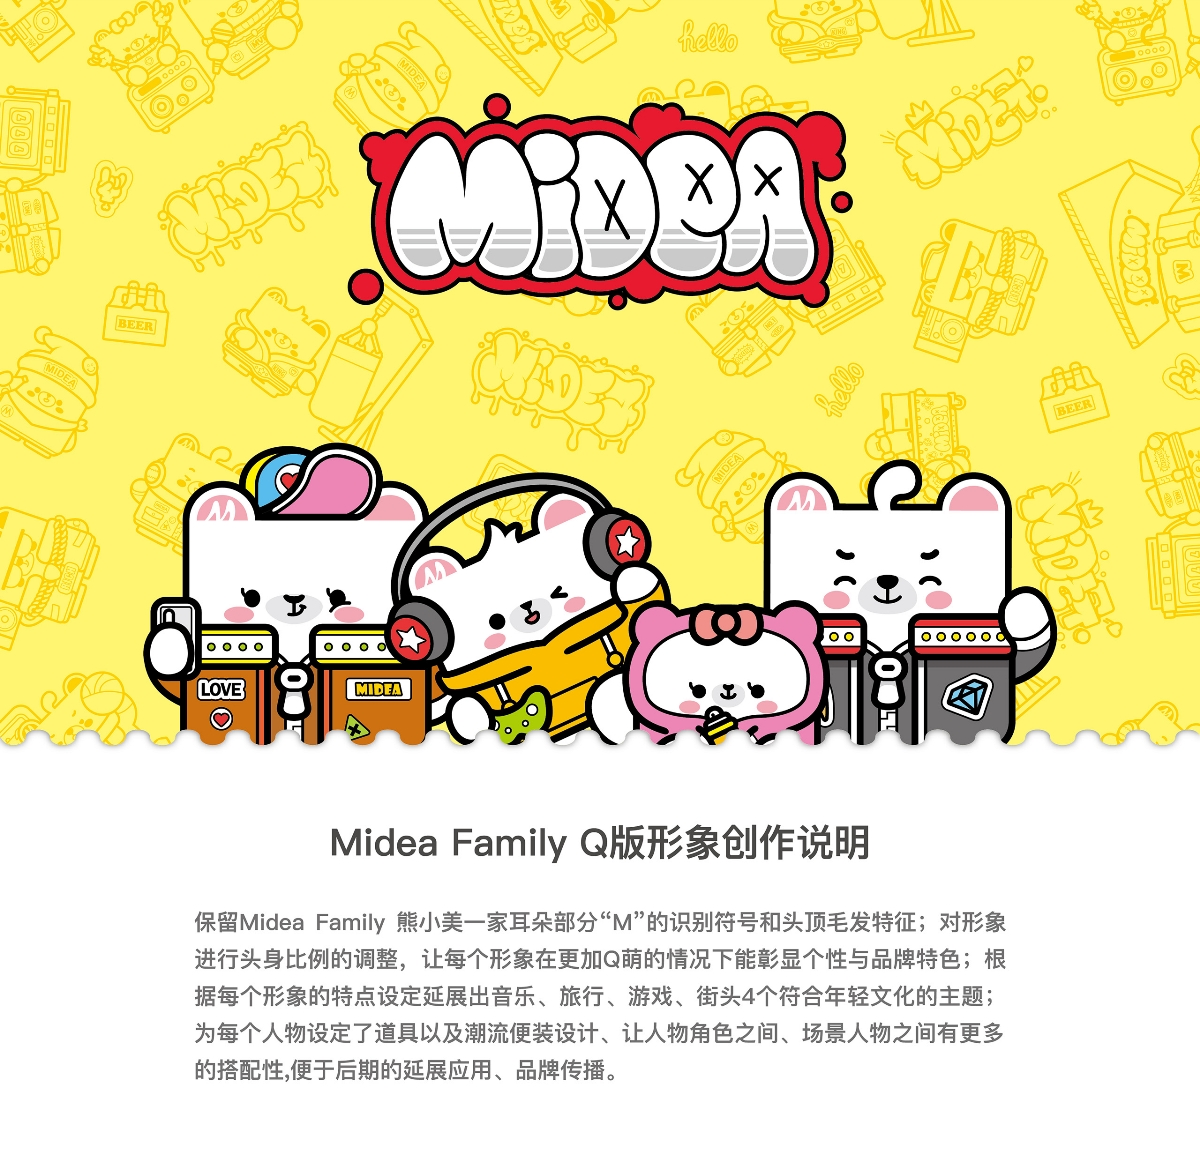 Midea Family Q版形象大变身